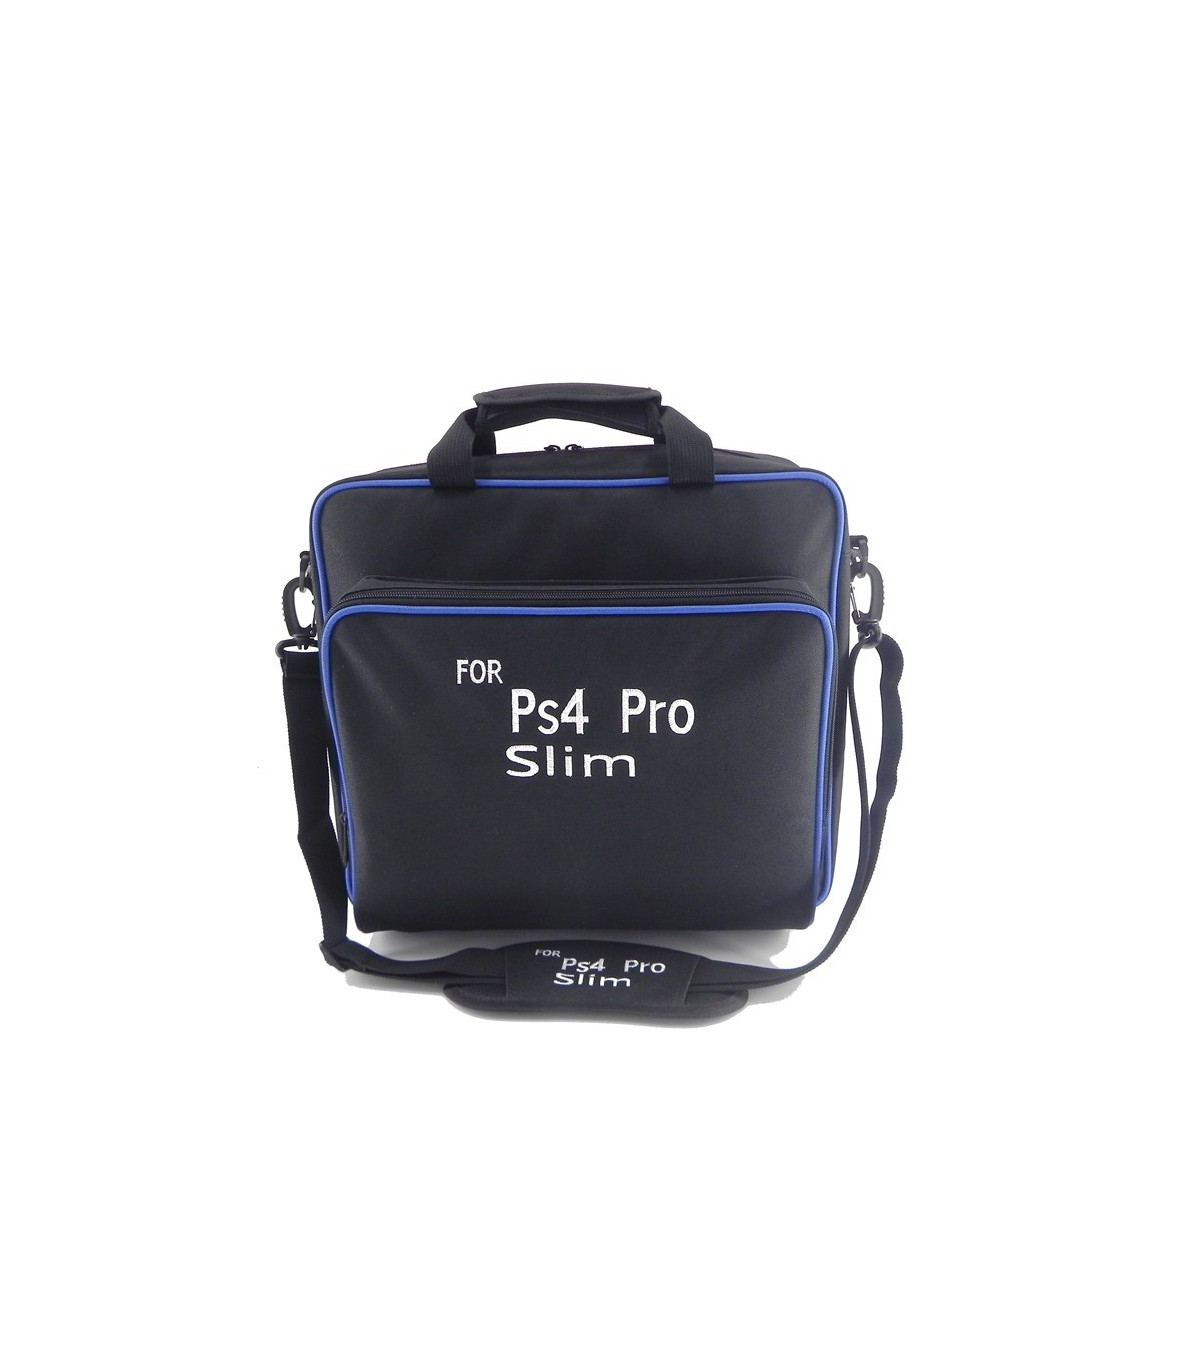 PS4 Pro & Slim Bag  کیف پلی استیشن 4 پرو و اسلیم